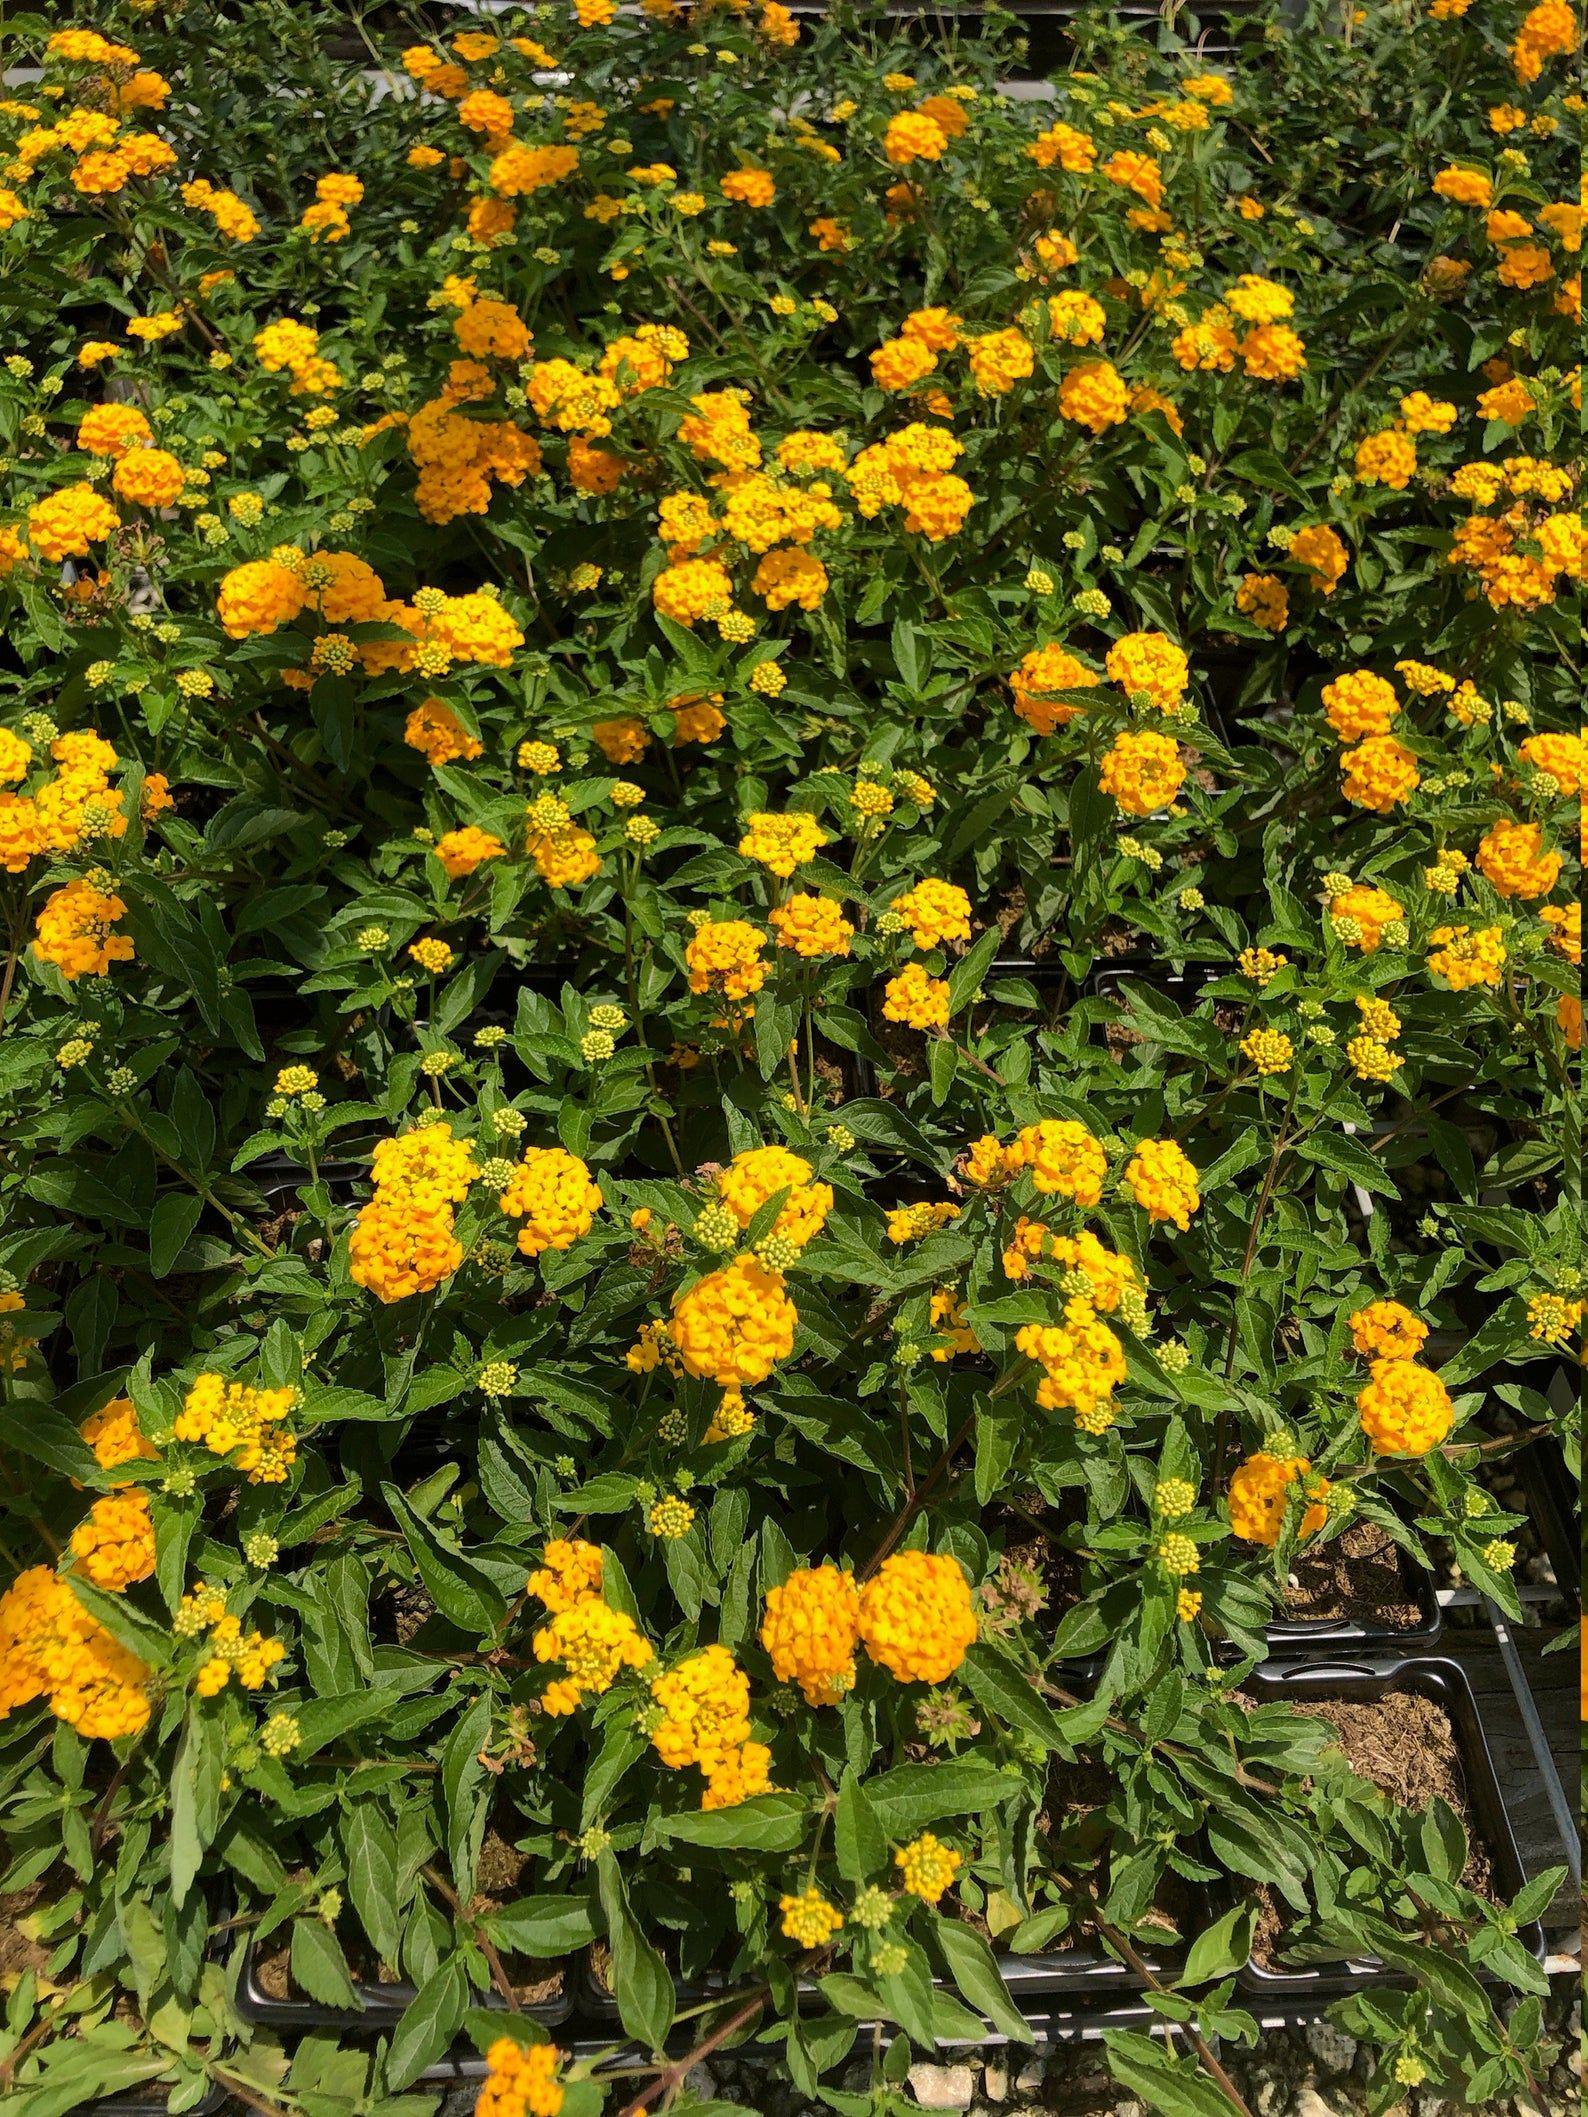 One Gallon New Gold Lantana Etsy In 2020 Lantana Garden Plant Identification Texas Landscaping